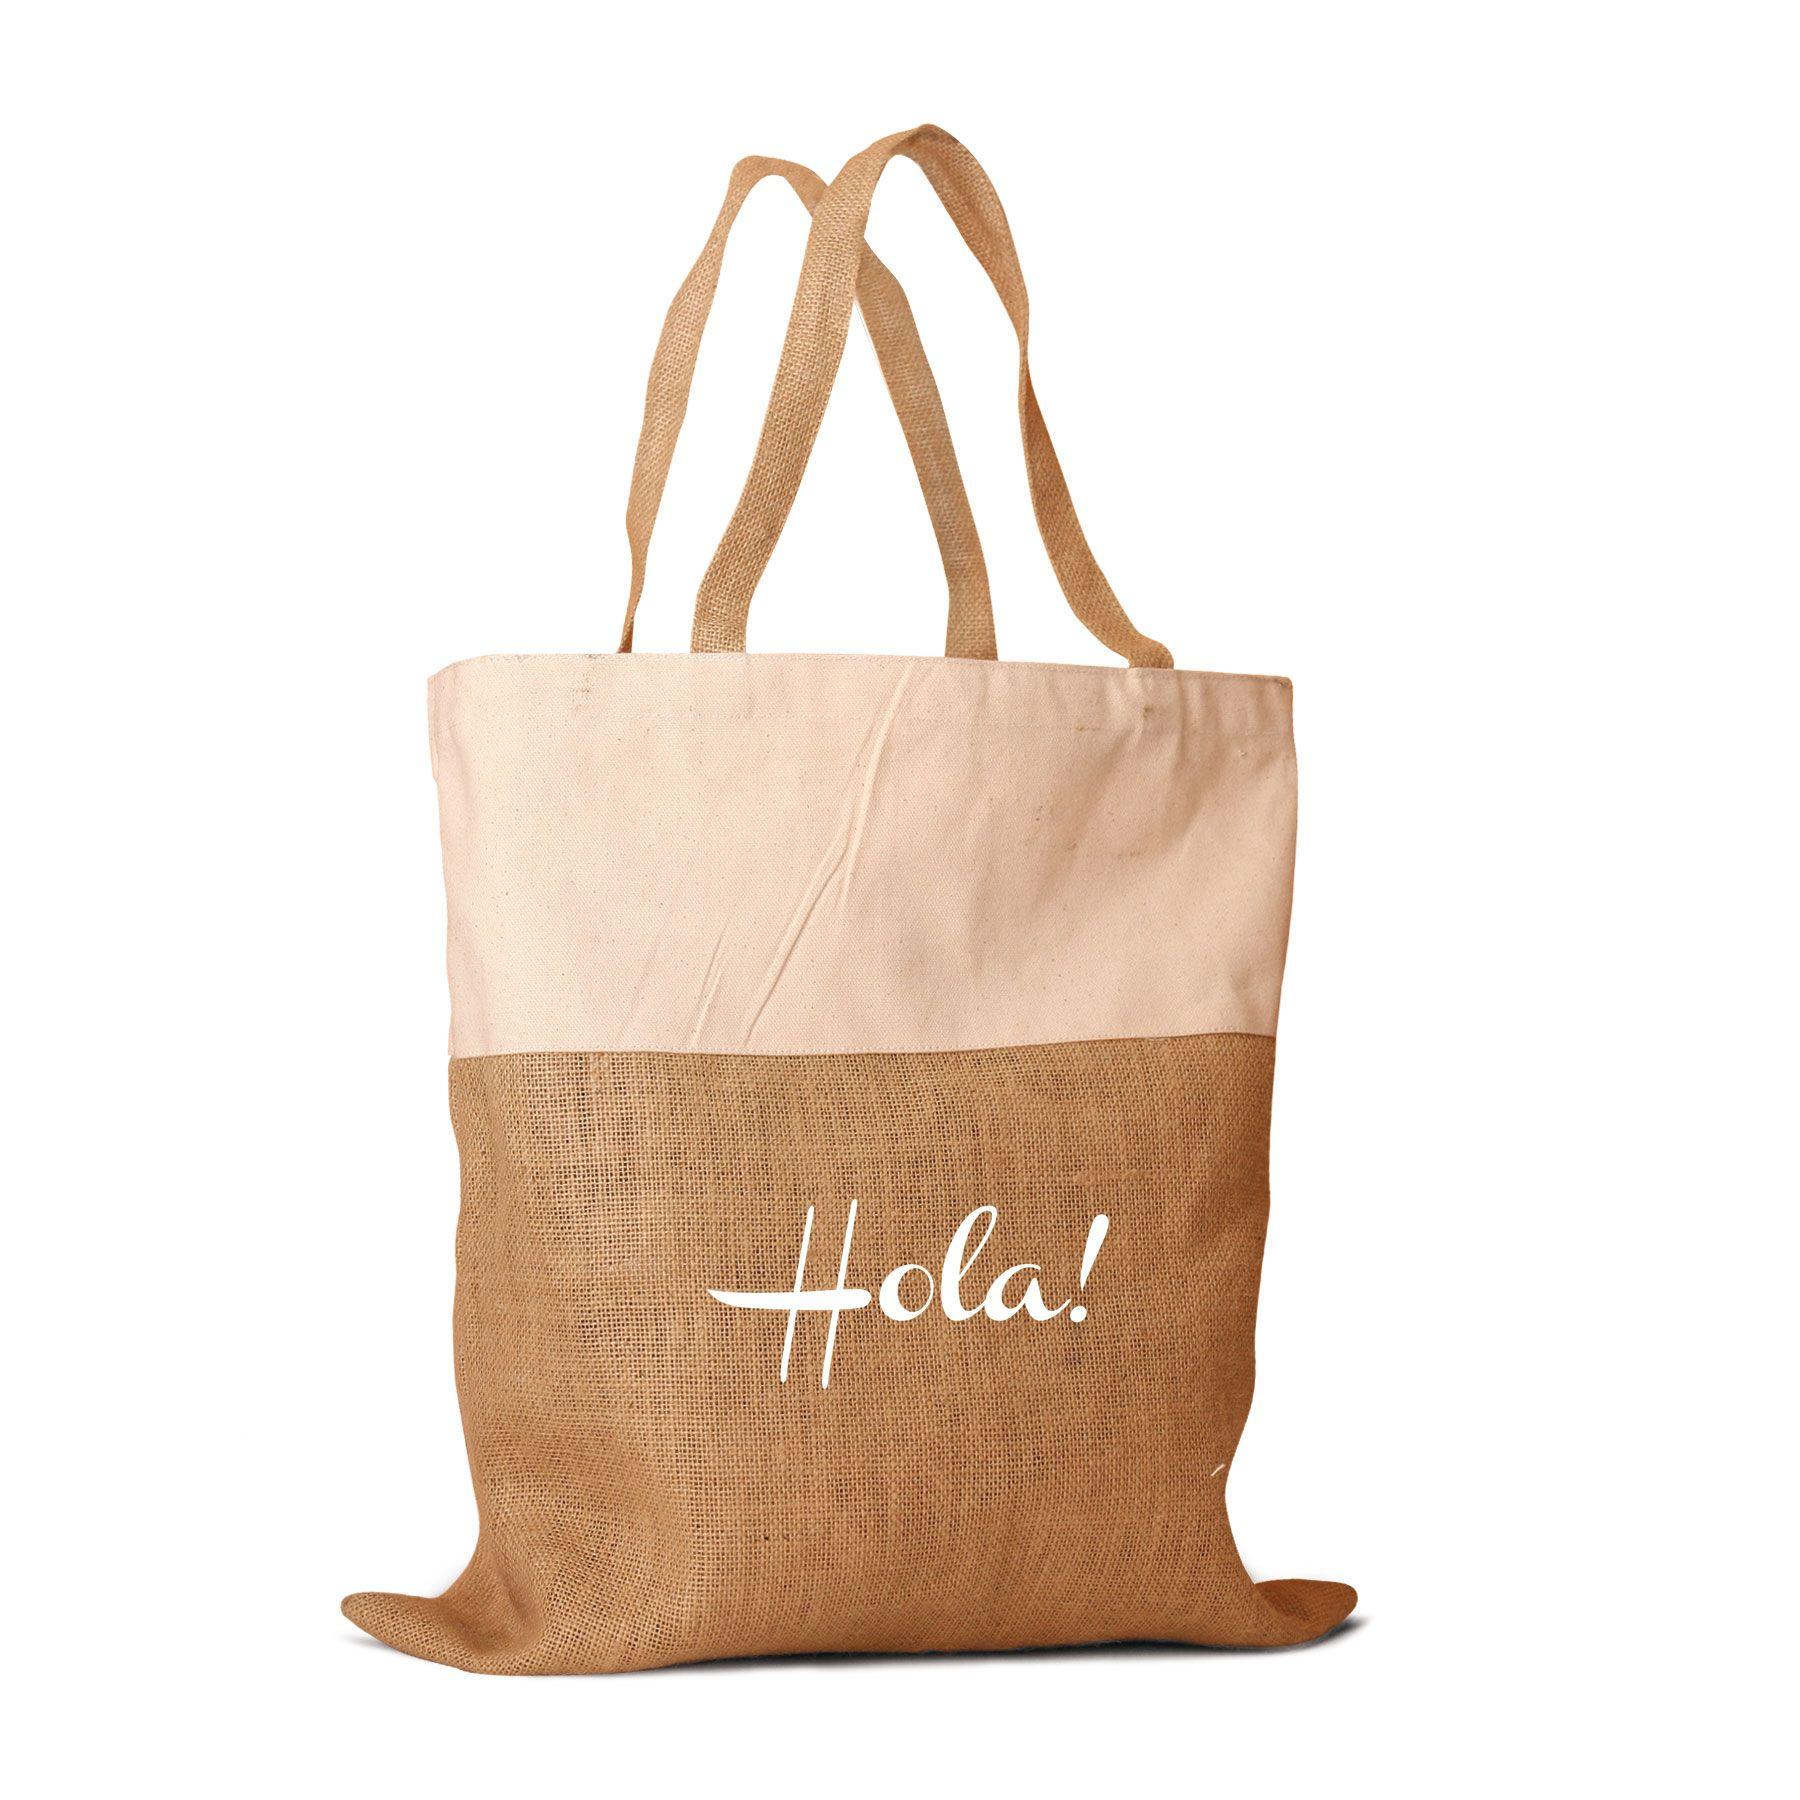 Clothes, Shoes & Accessories Ladies Designer Shoulder Shopping Hand Bag Natural JUTE Beach Multi Purpose